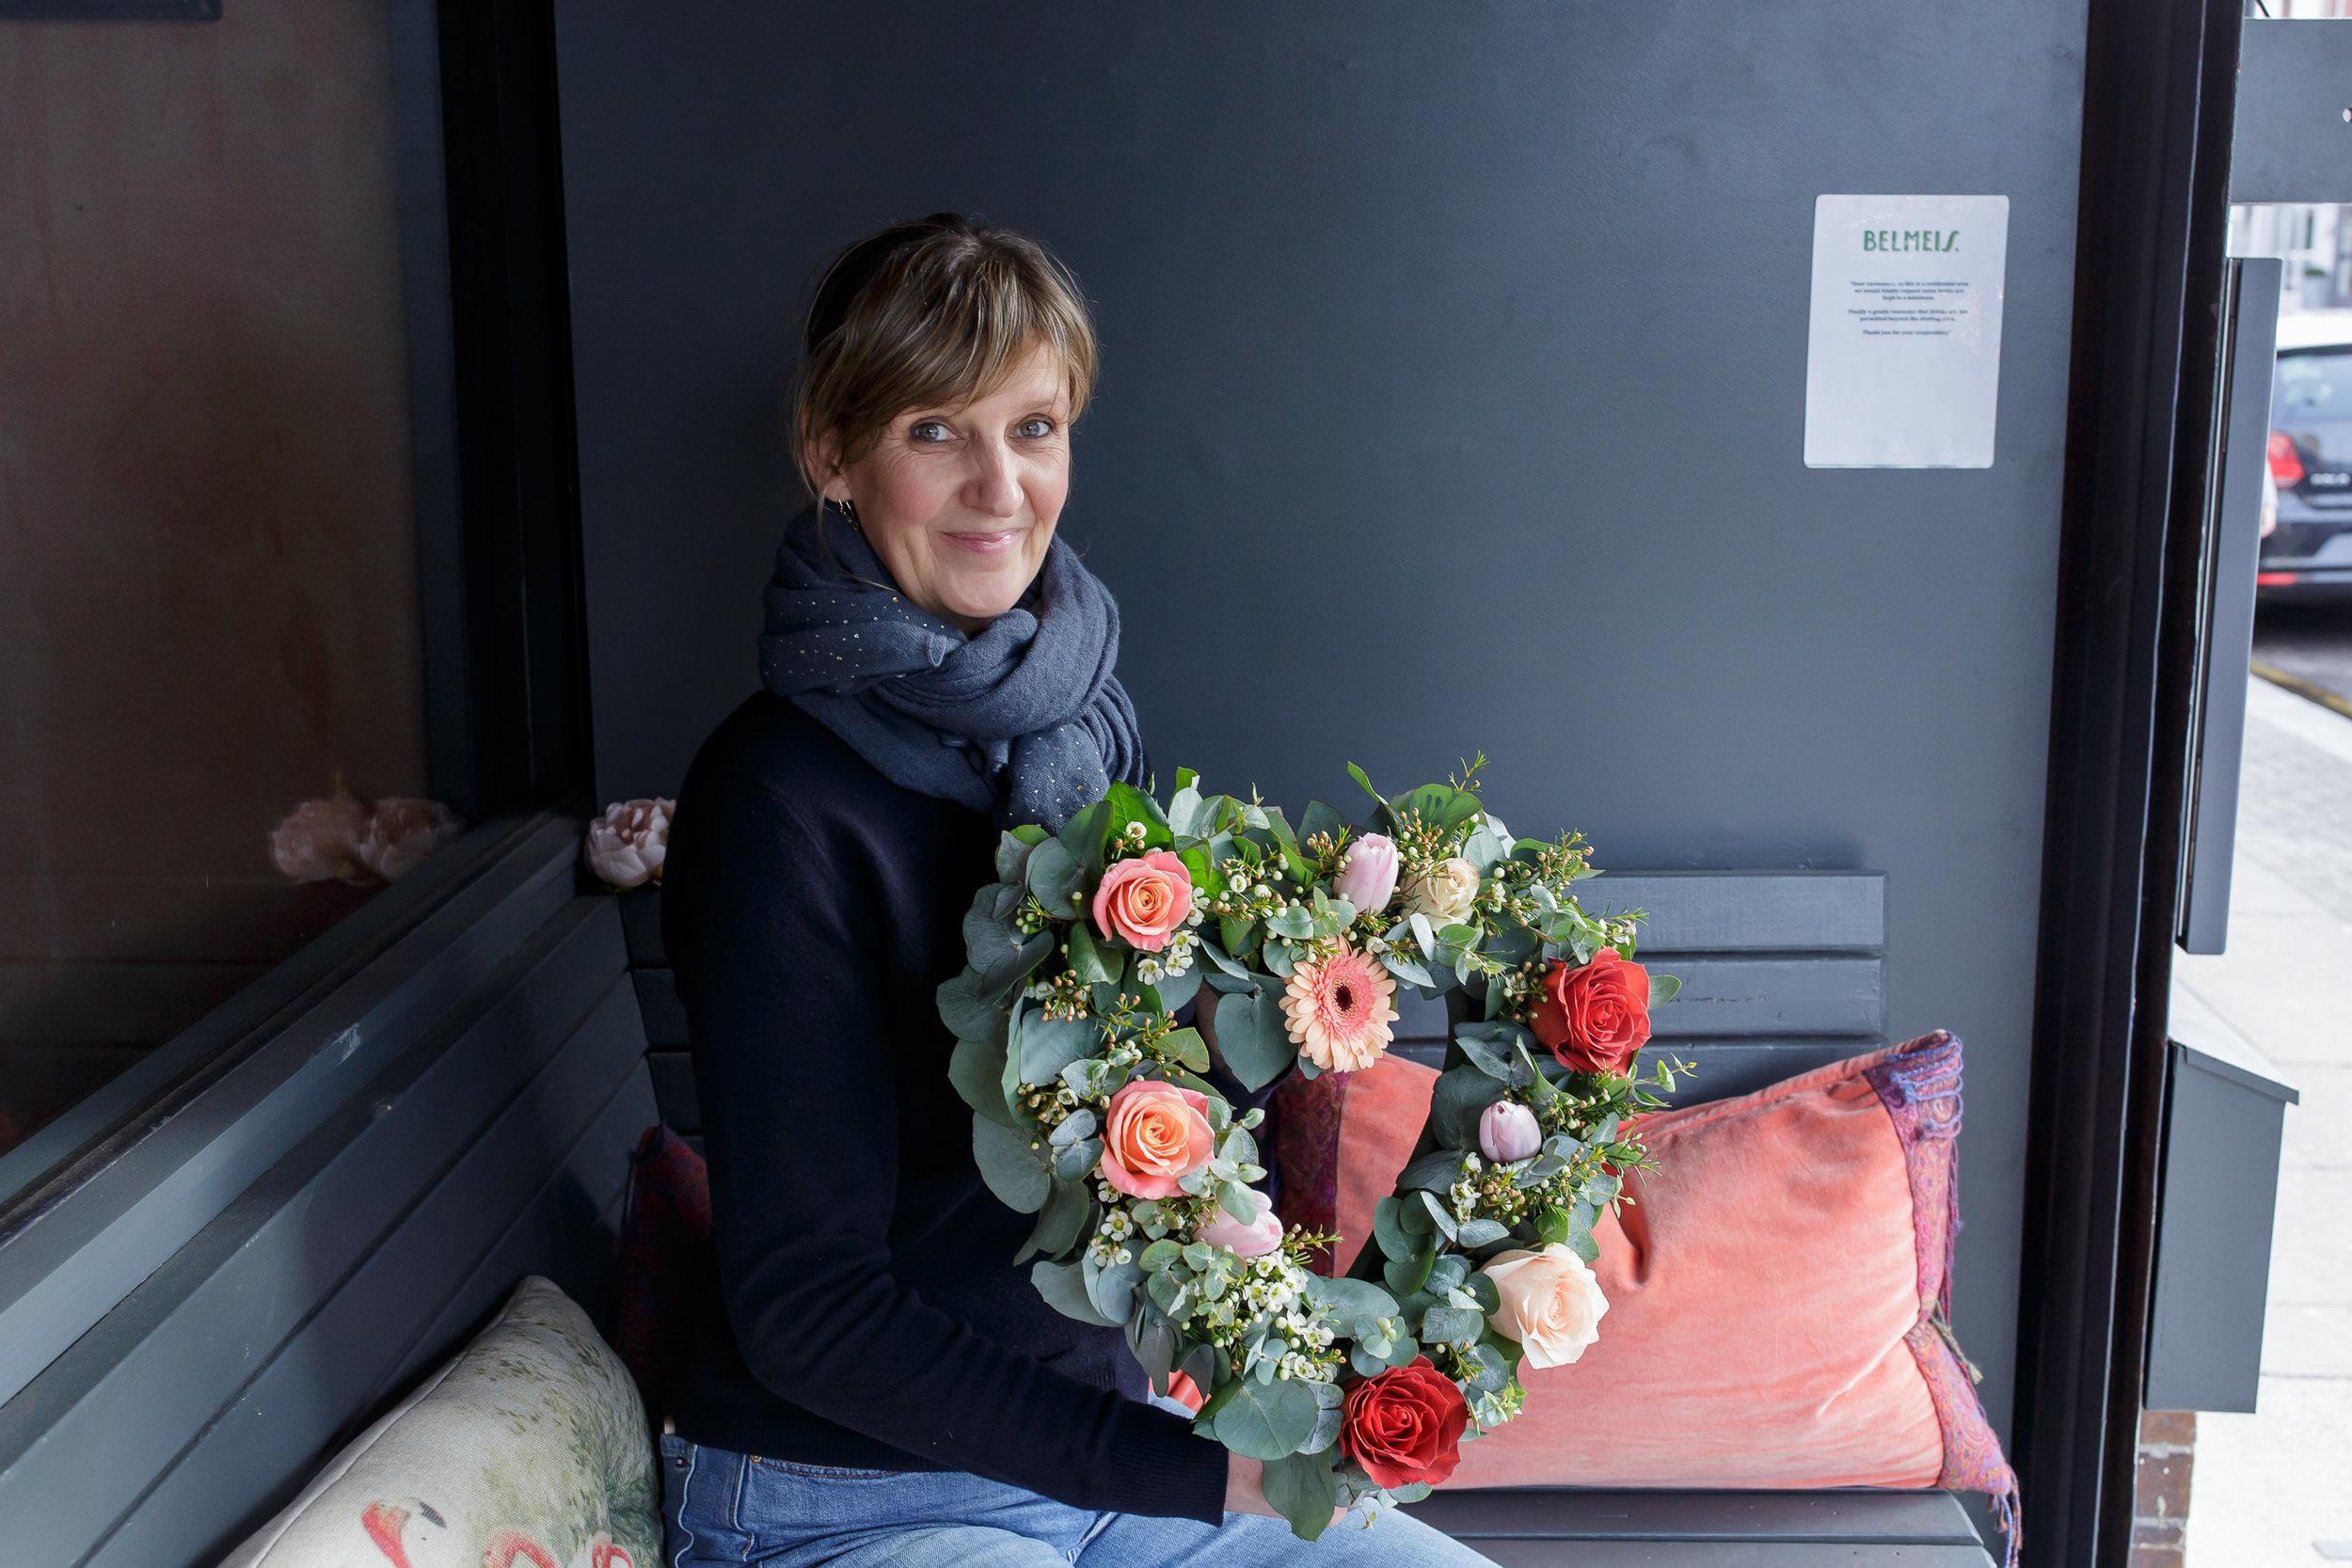 Bilen-Floral-Workshop-87.jpg